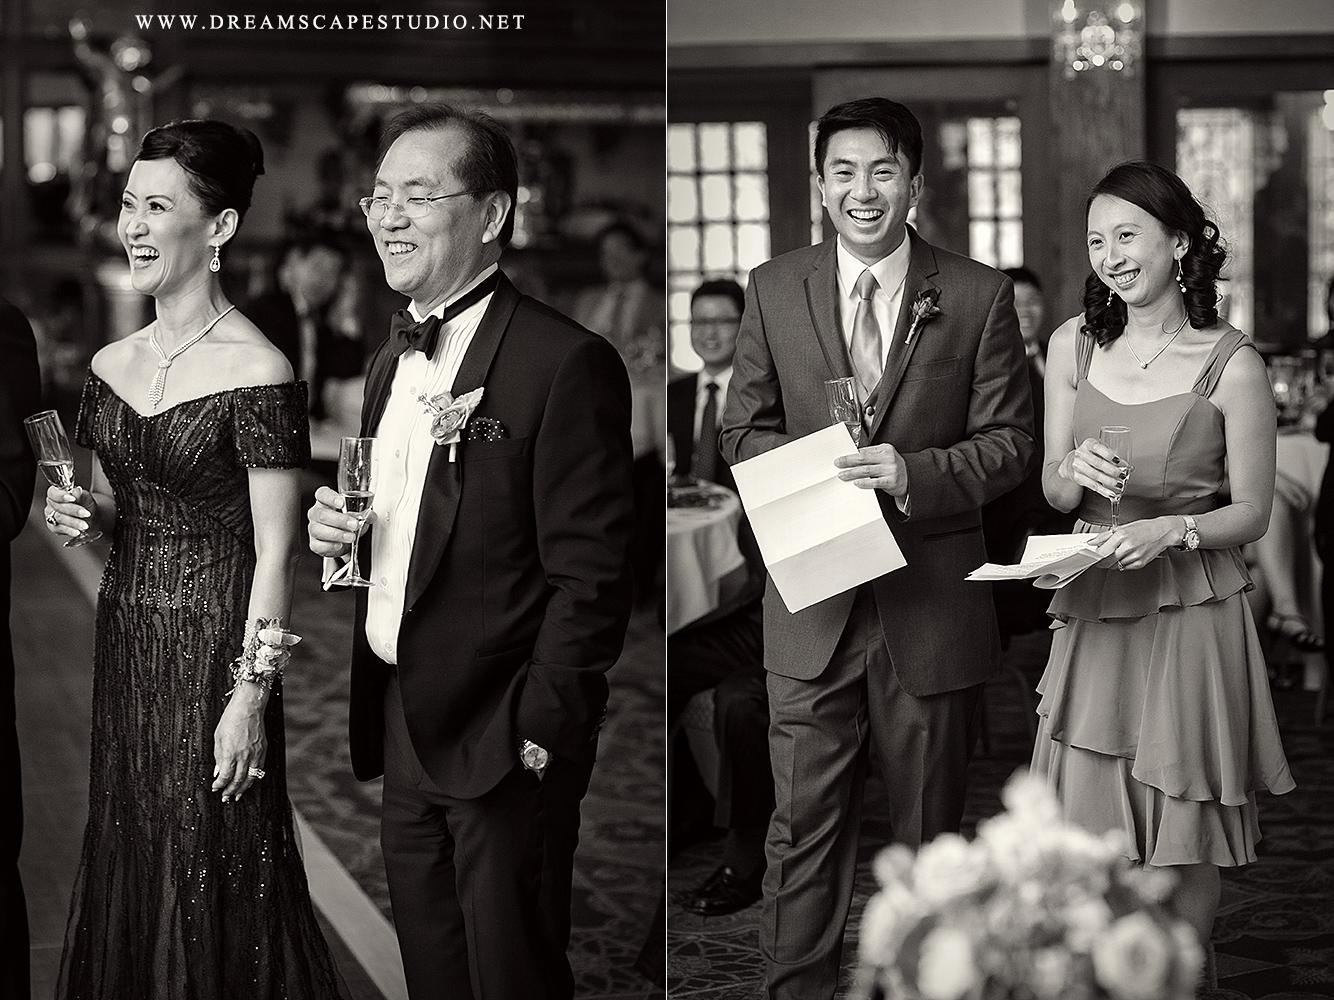 CT_Wedding_Photographer_PaHe_Blog_34.jpg